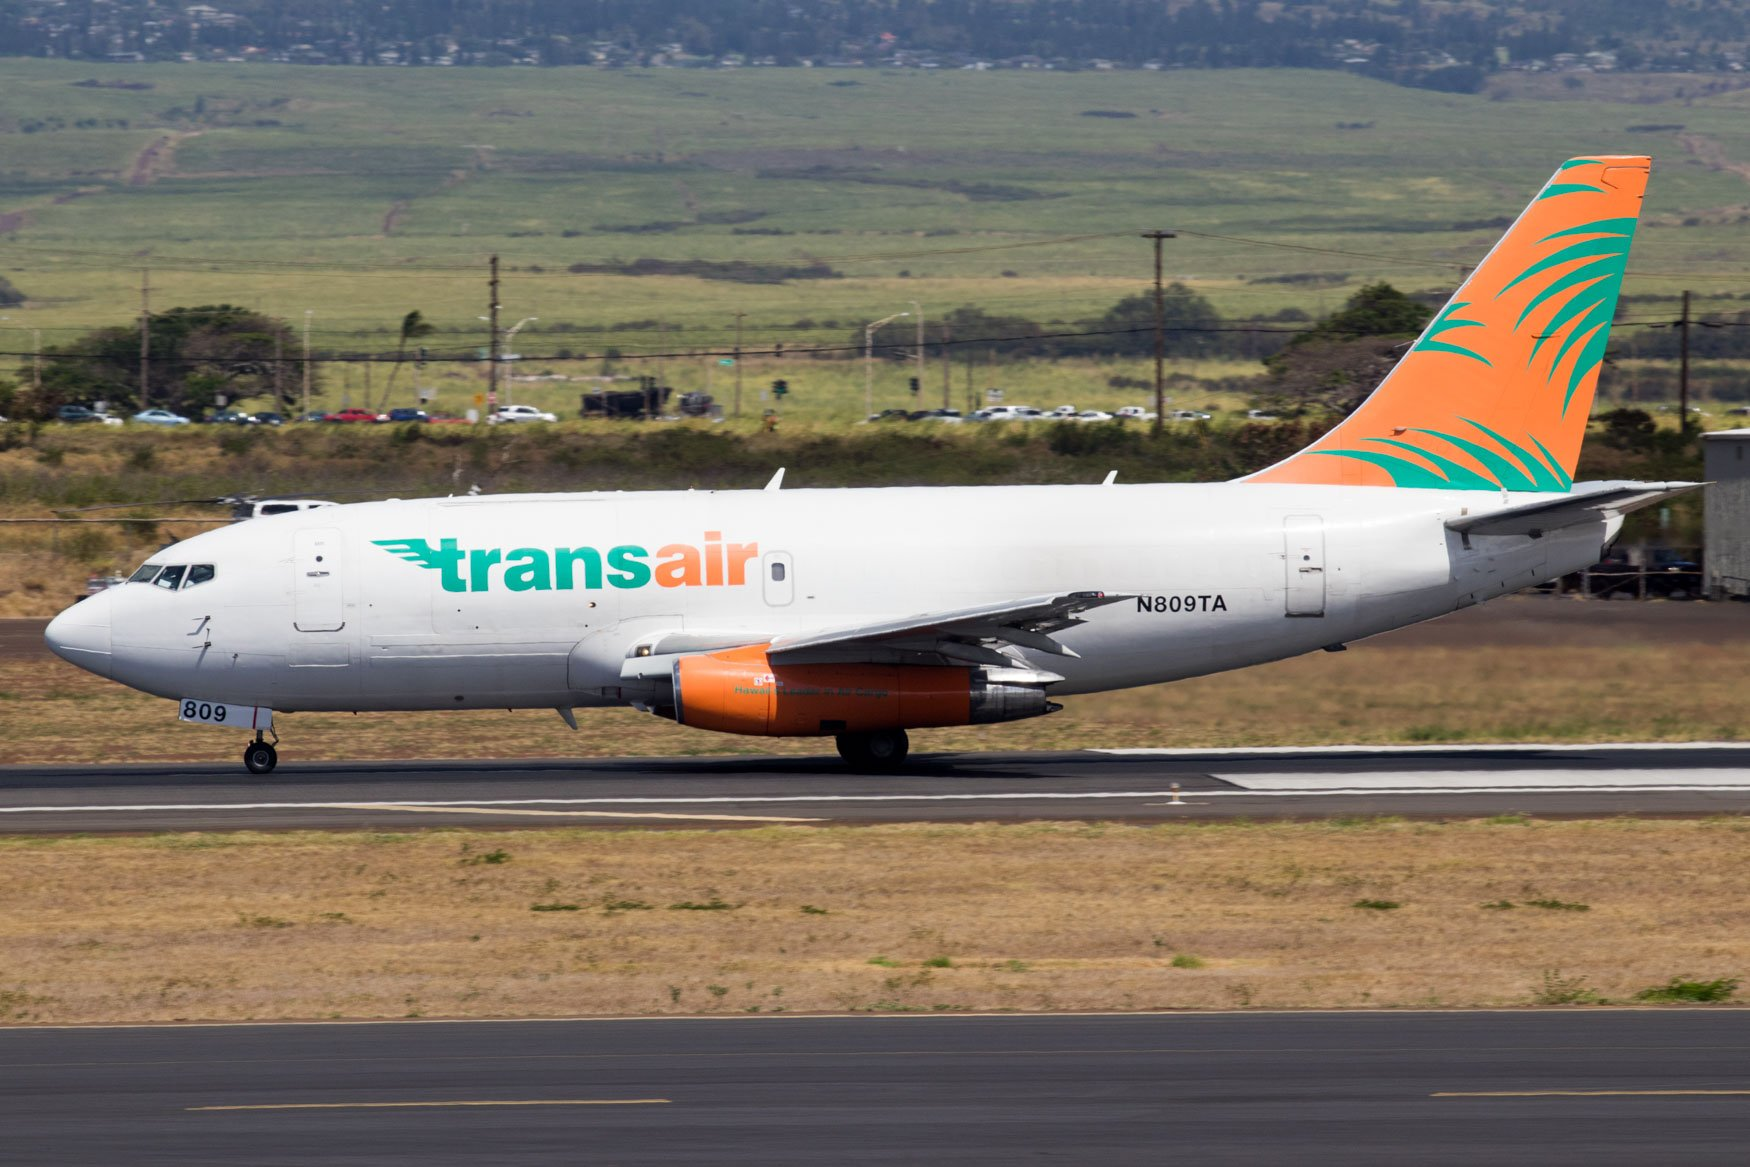 Transair Boeing 737-200